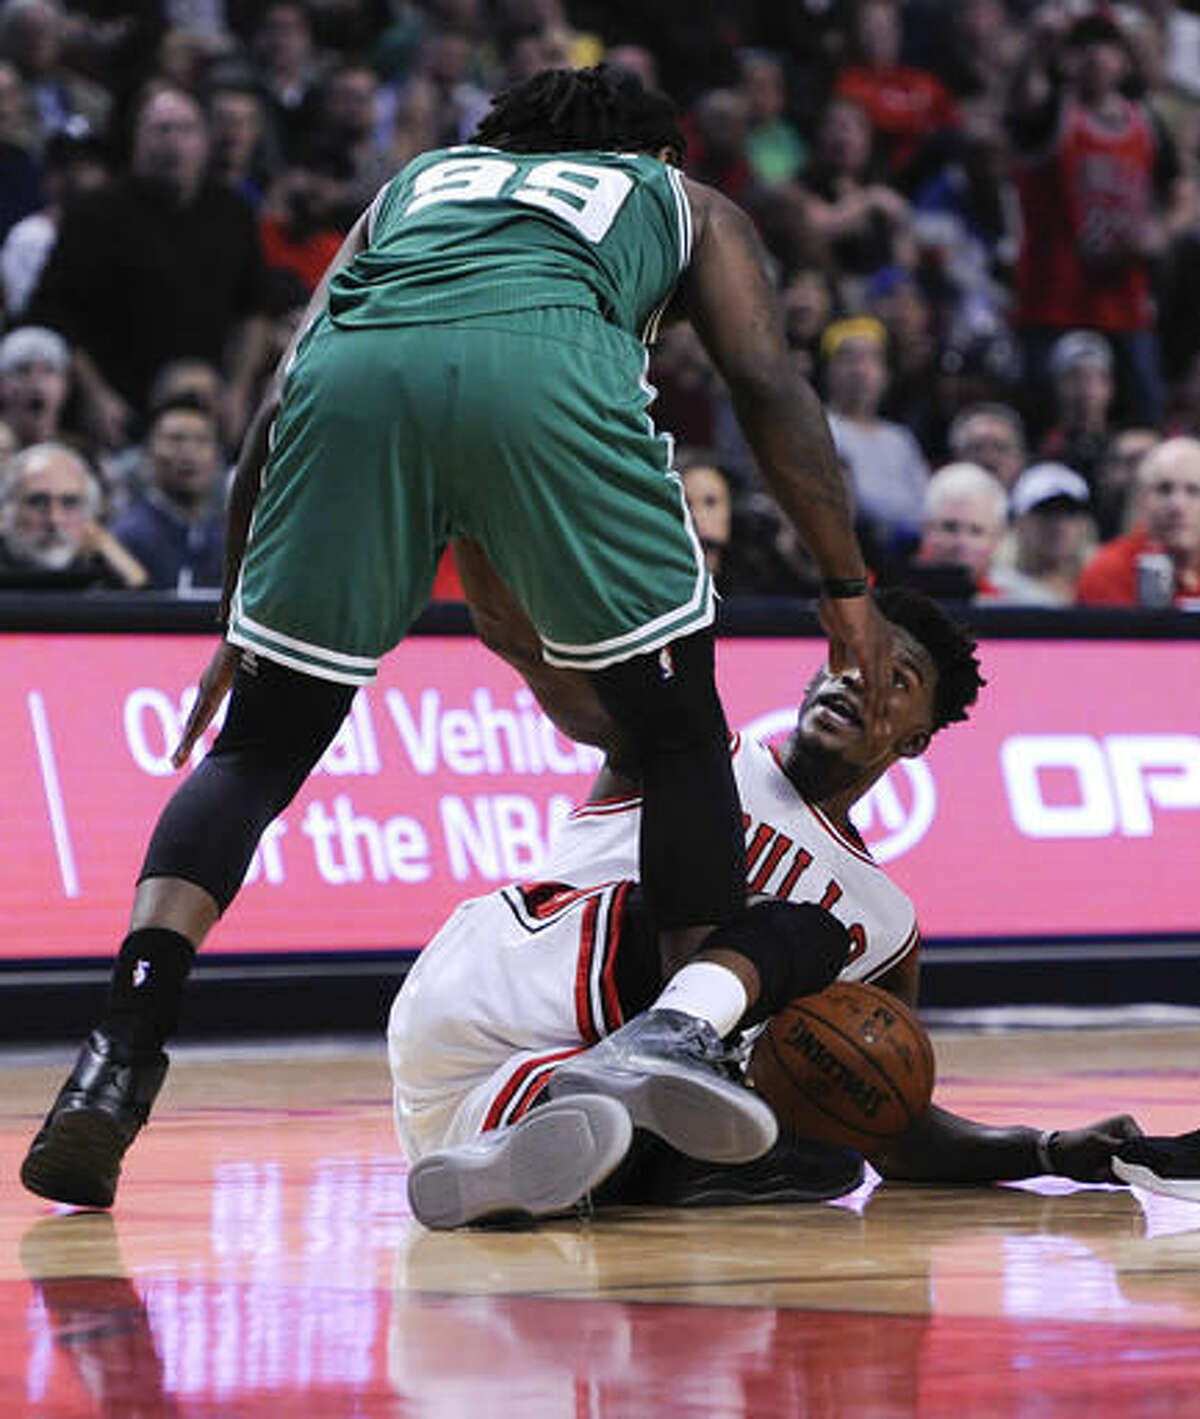 Chicago Bulls' Jimmy Butler and Boston Celtics' Jae Crowder (99) react as the teams argue during the second quarter of an NBA basketball game Thursday, Oct. 27, 2016, in Chicago. (AP Photo/Matt Marton)